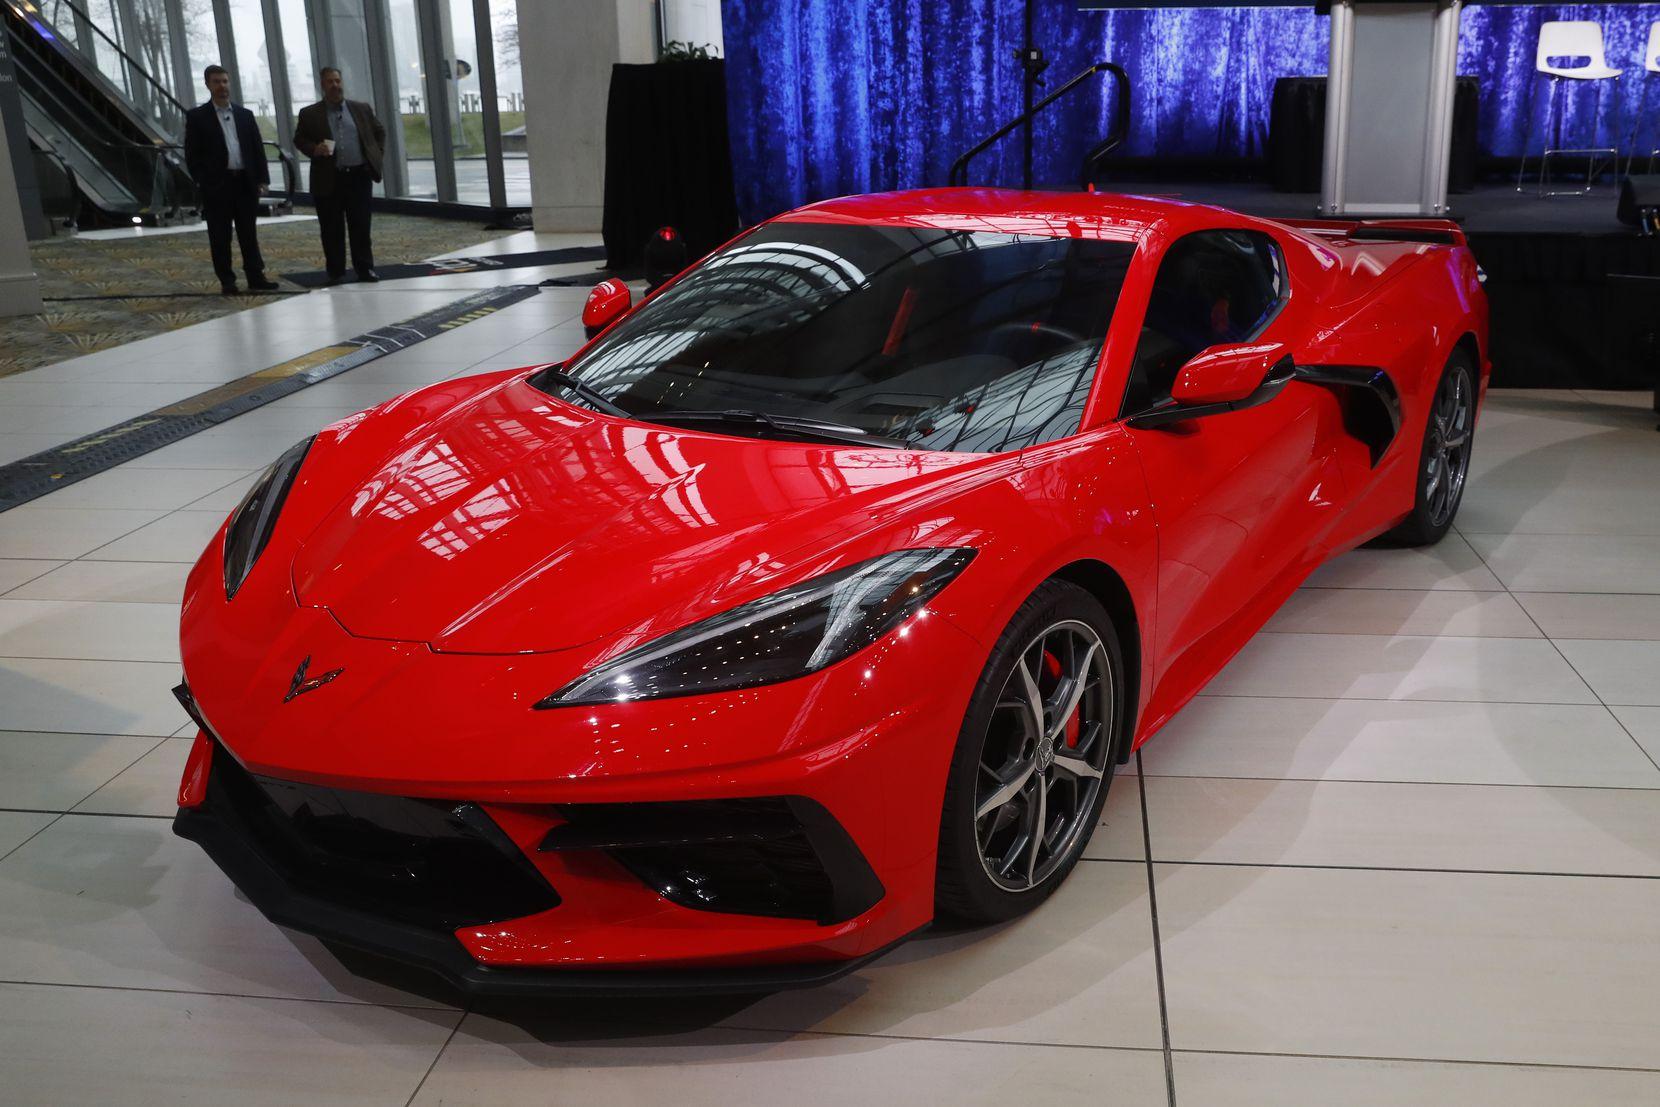 The Corvette starts at $58,900. (AP Photo/Paul Sancya)